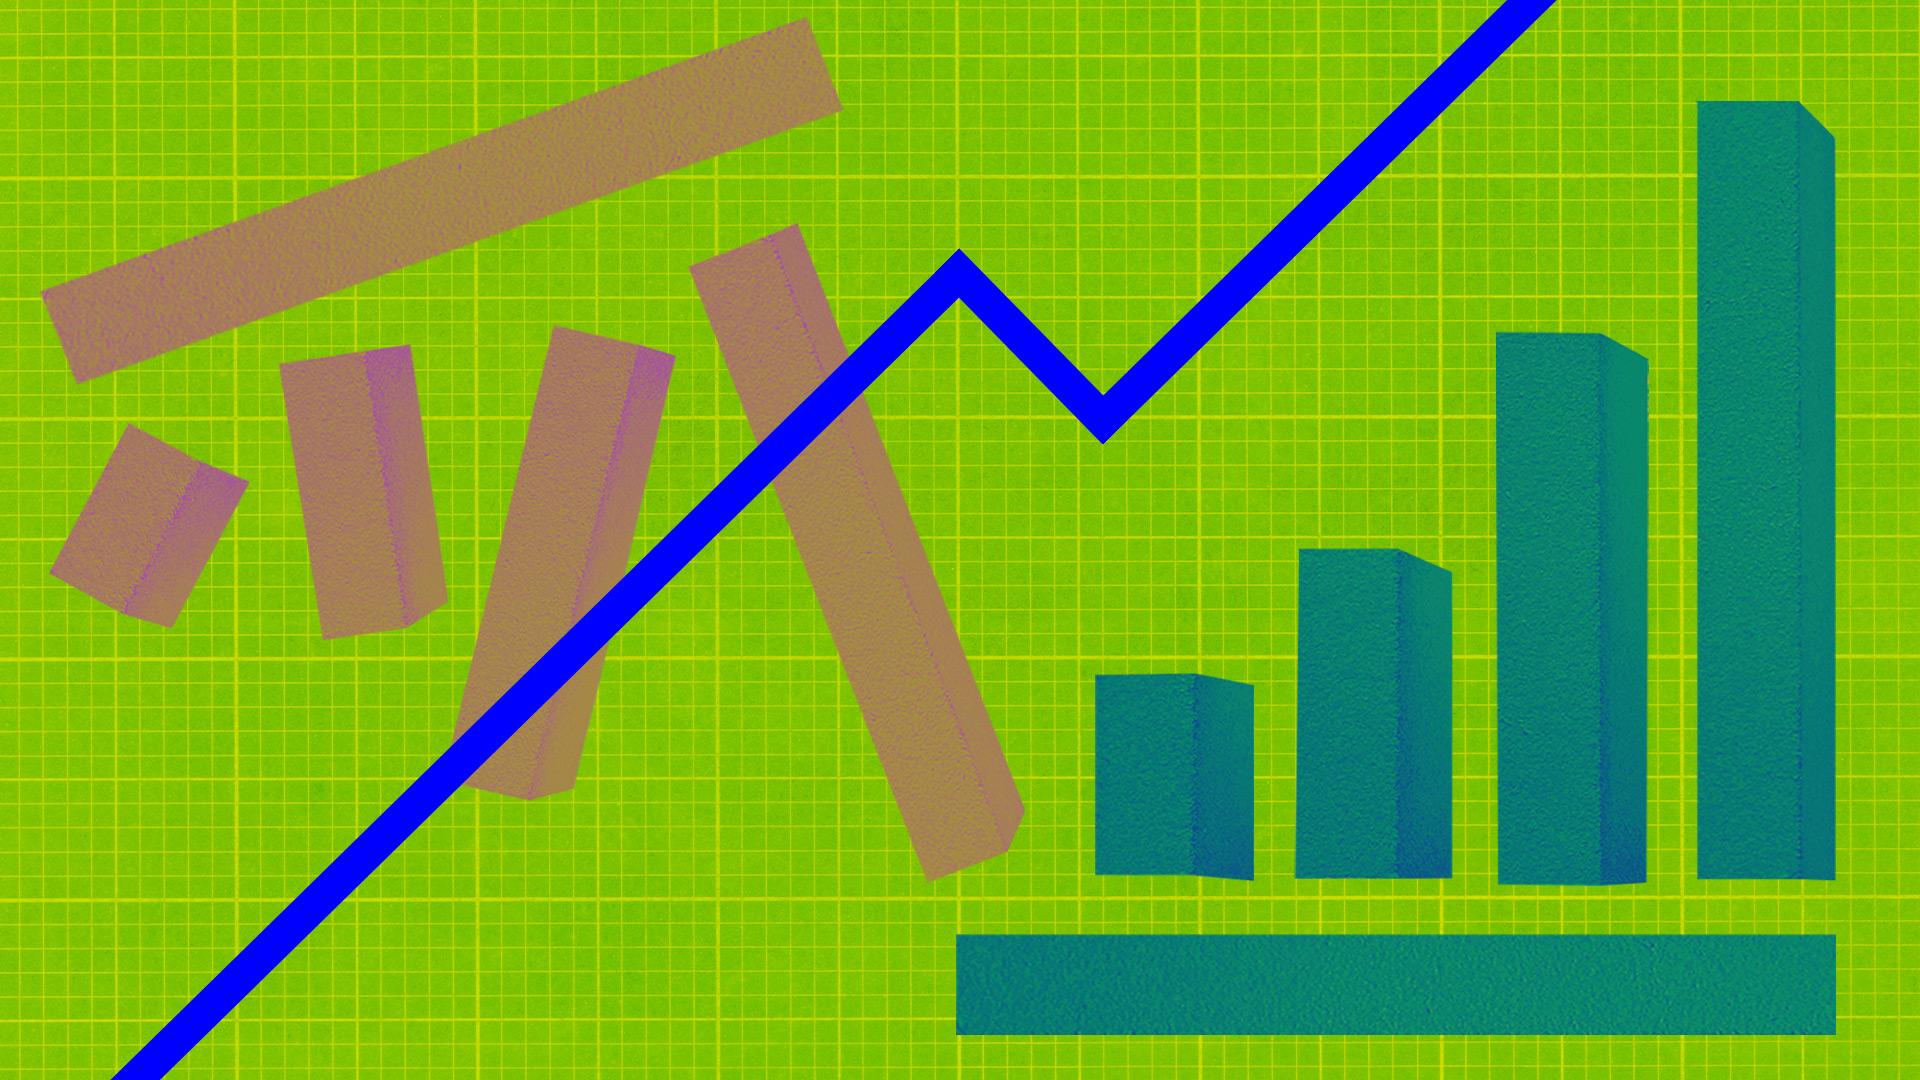 DeFi project Strips Finance raises $8.5 million to launch interest rates trading platform